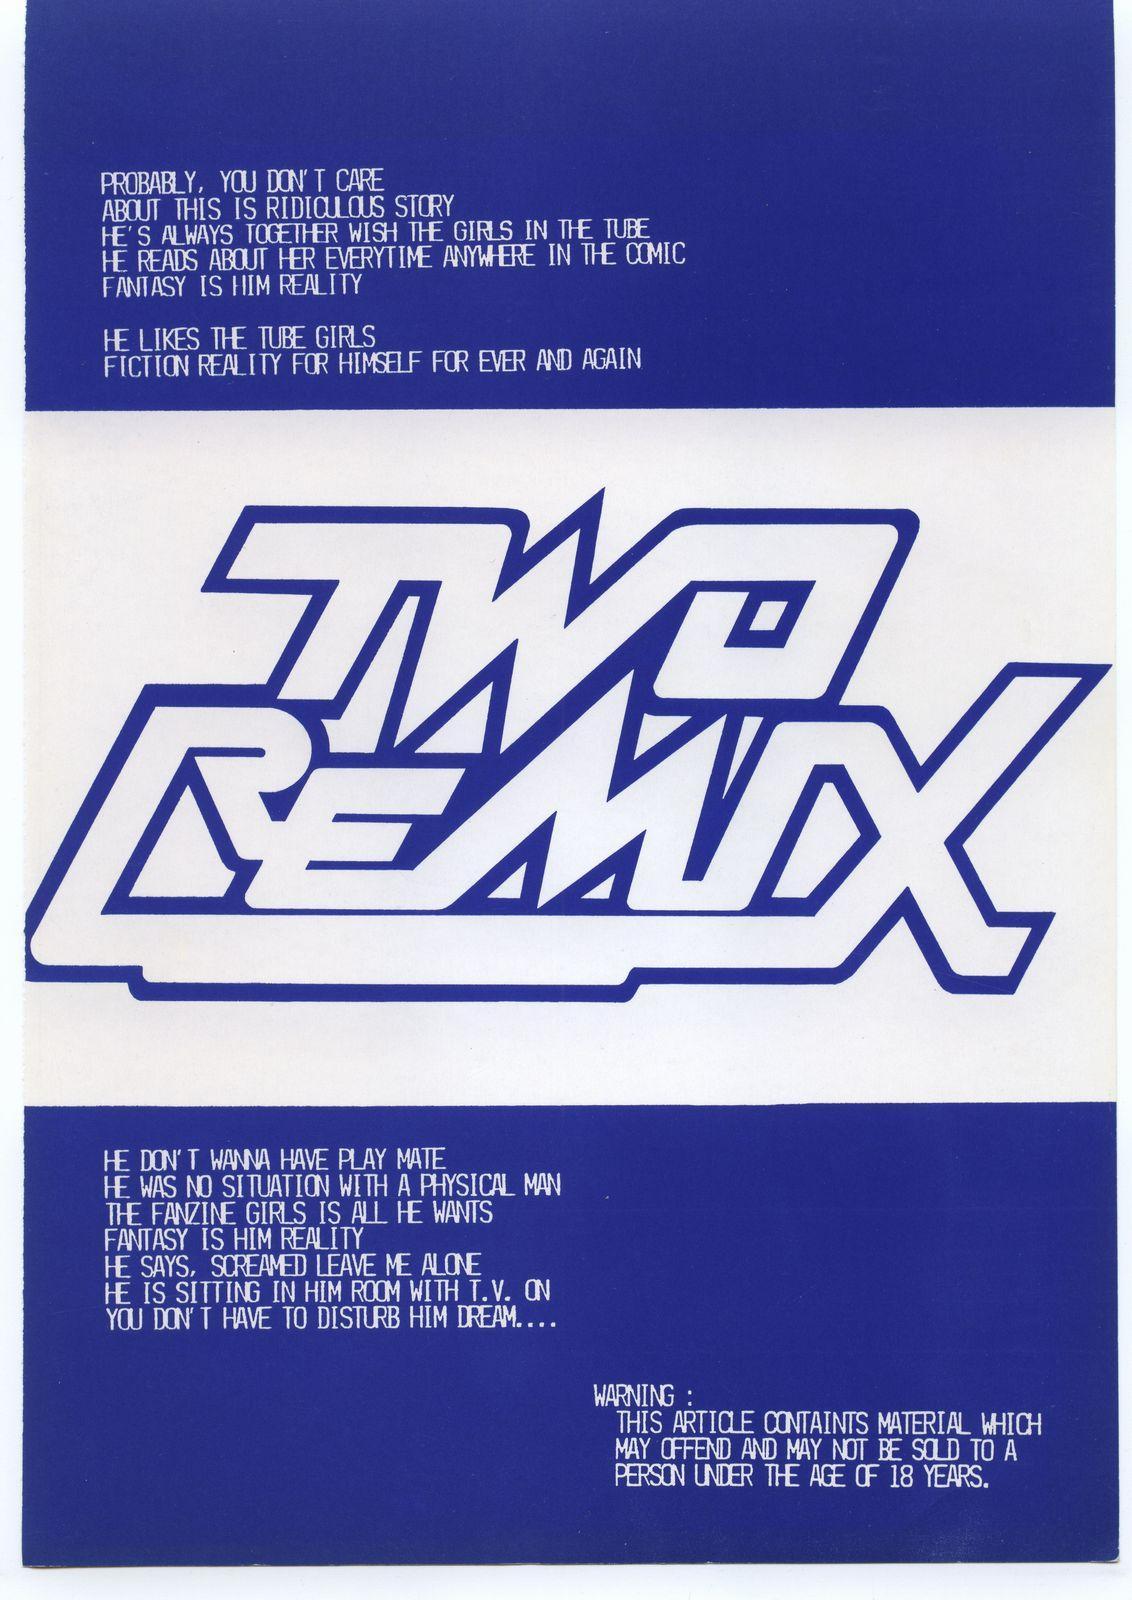 TWO REMIX 207